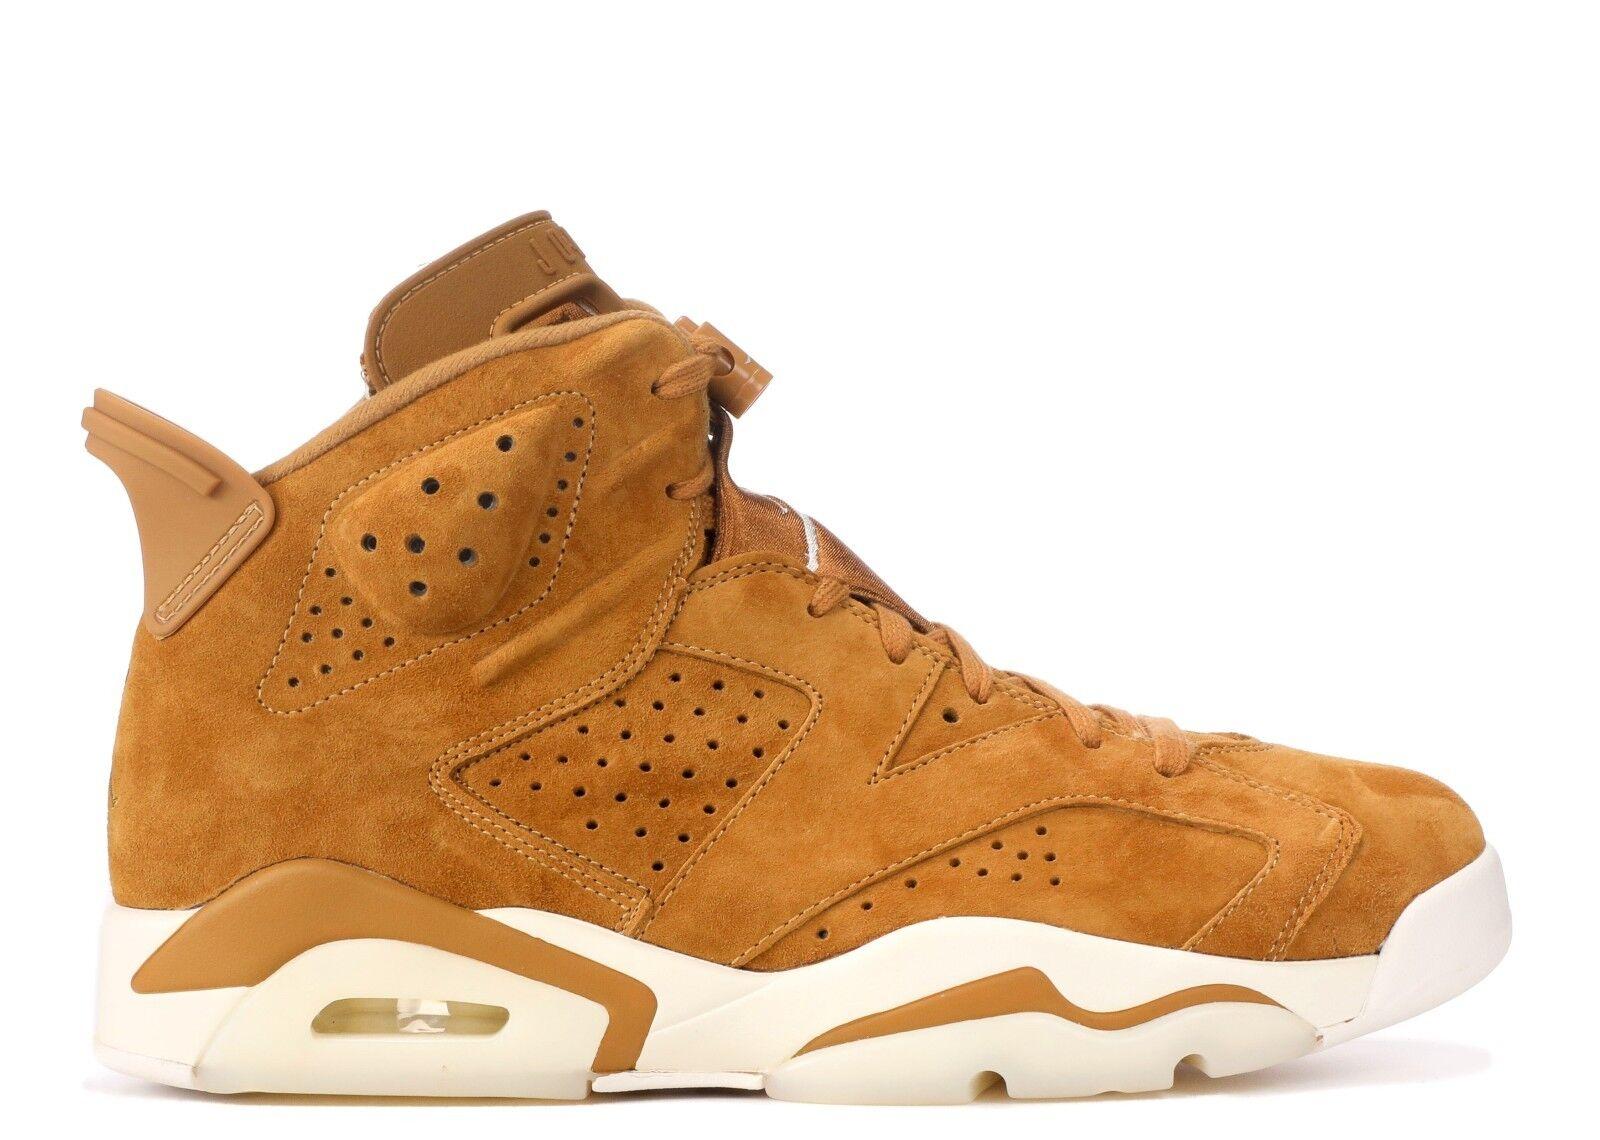 Mens Brand New Air Jordan 6 Retro  golden Harvest  Fashion Sneakers